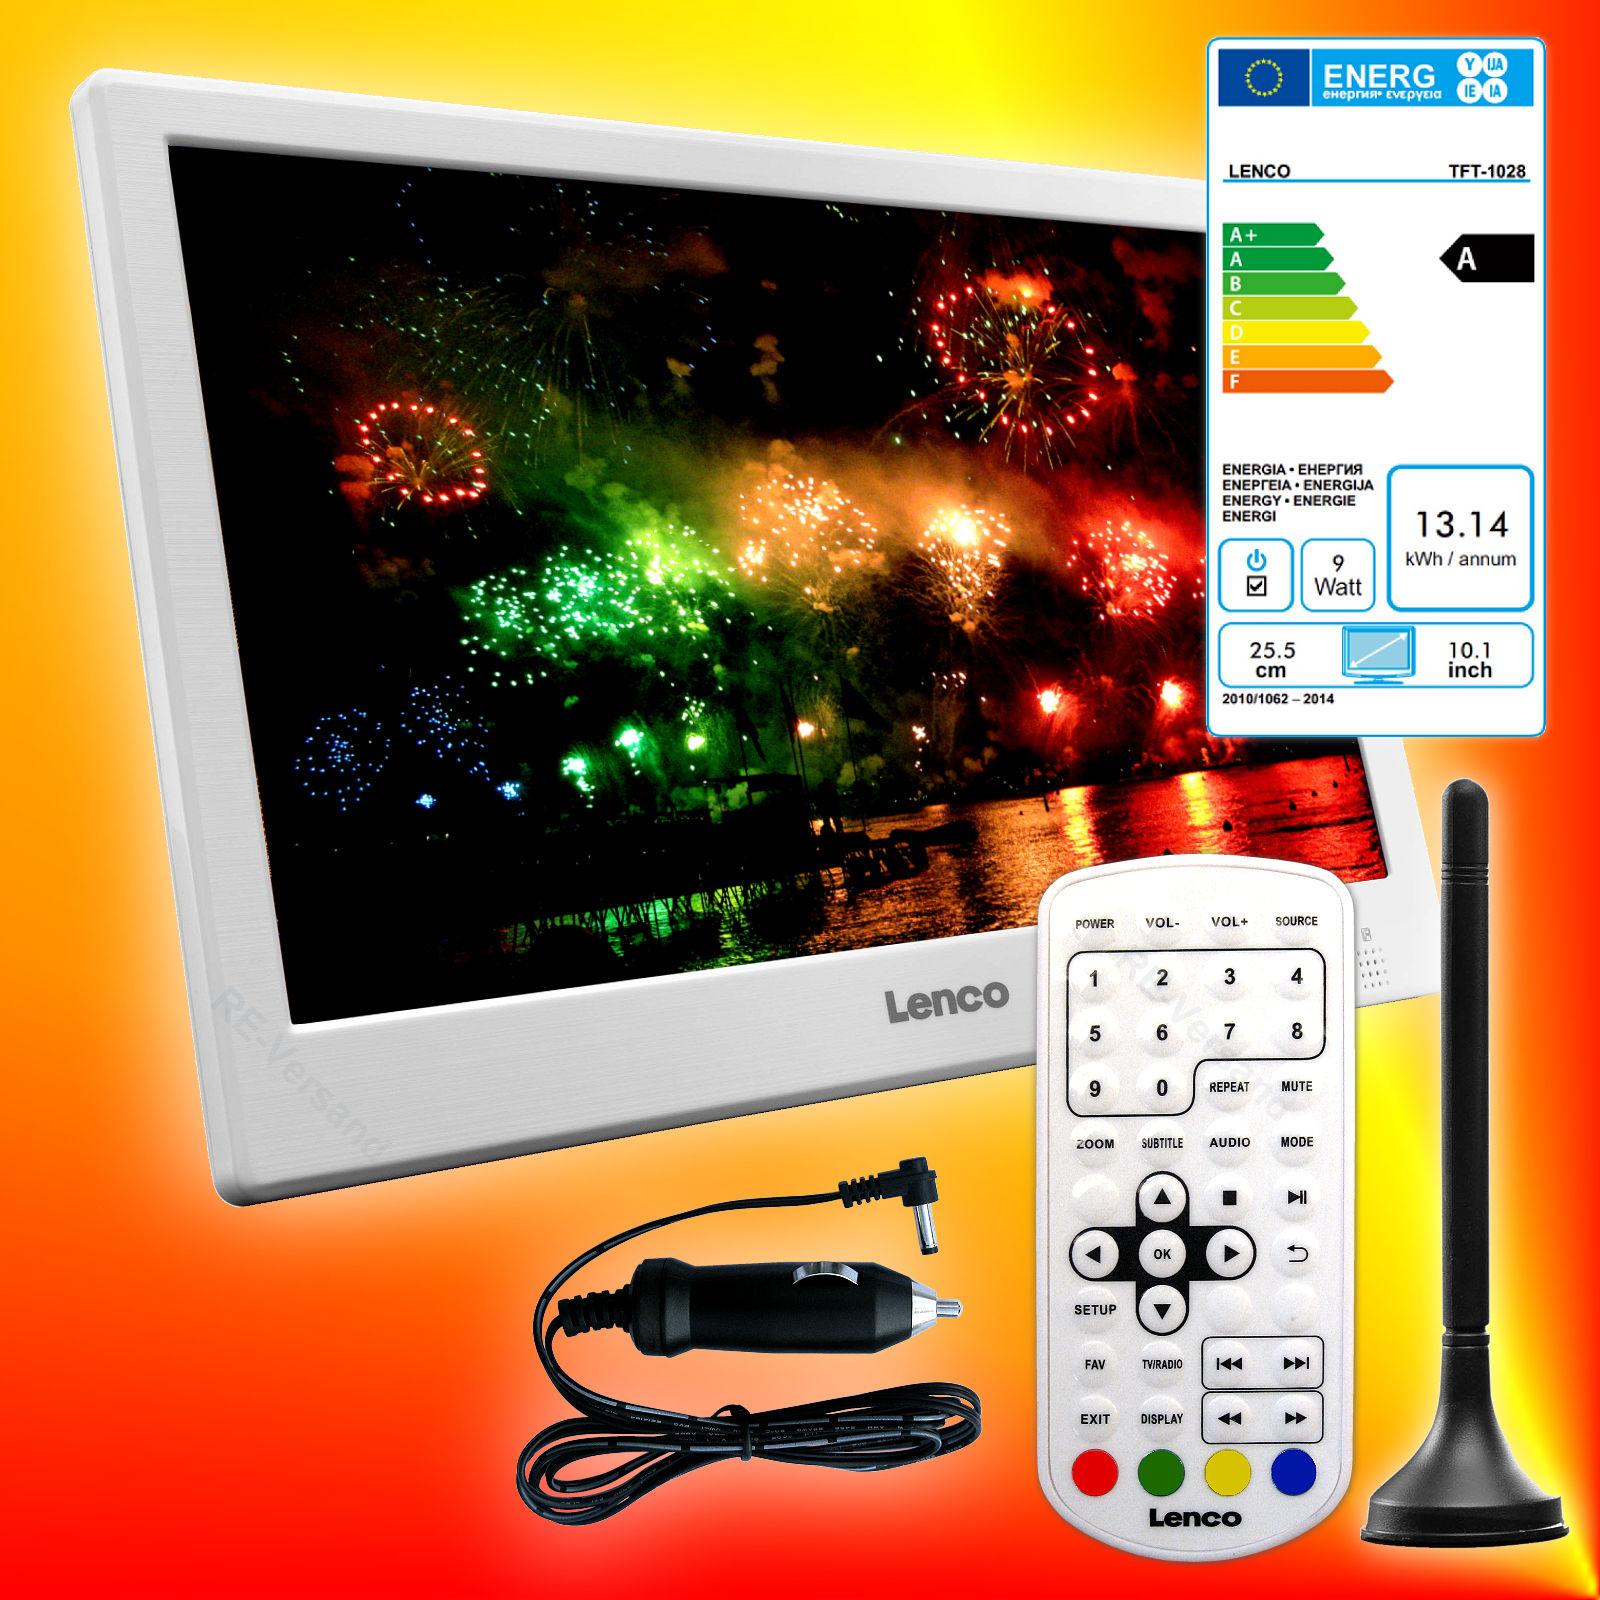 Lenco TFT-1028 Weiß tragbarer DVB-T2 HD LED-TV 12V/230V Fernseher USB HDMI EEK A